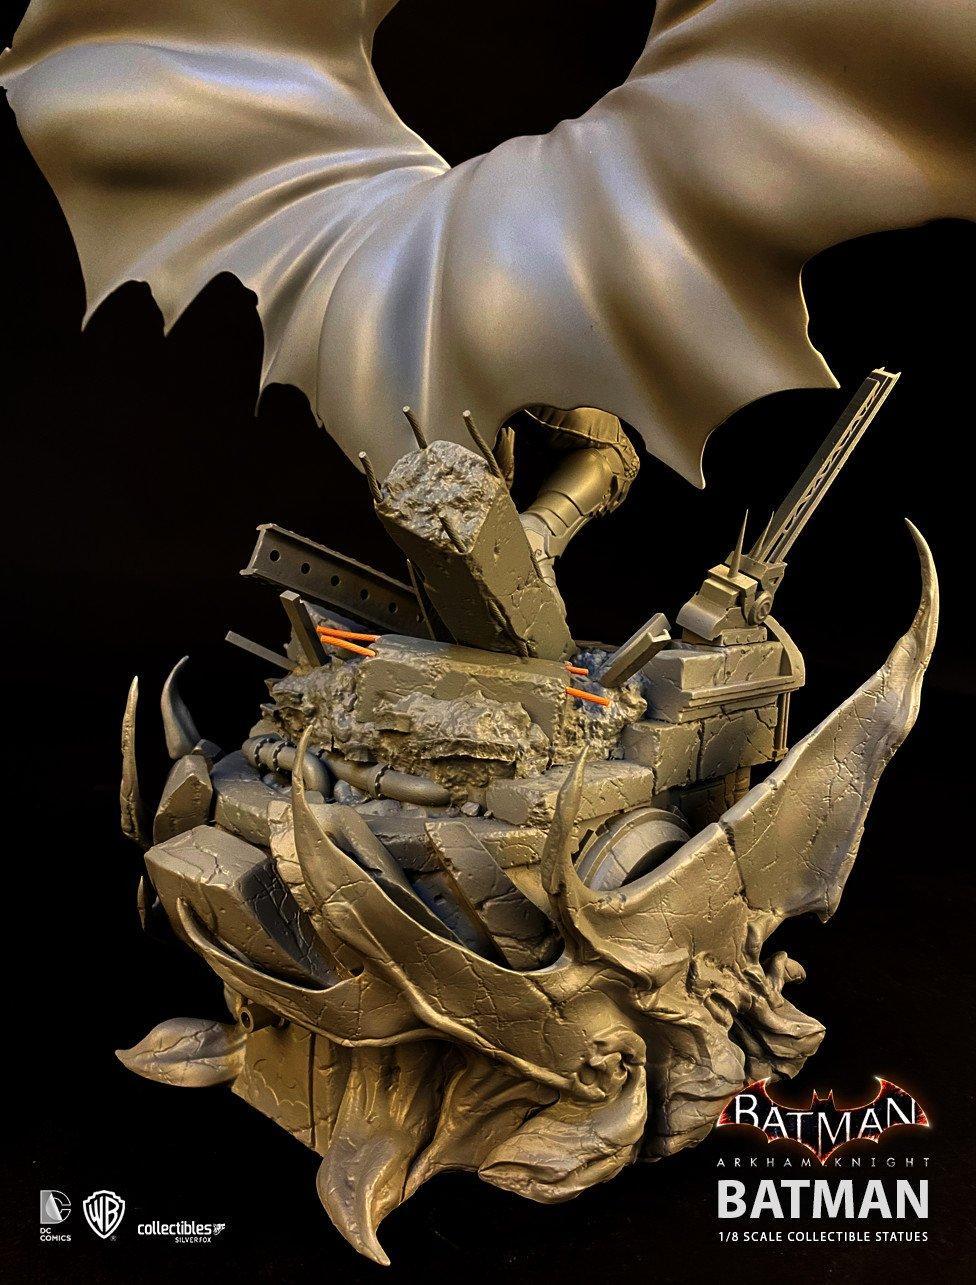 Batman siver fox collectibles batman arkham knight 1 8 scale statue5